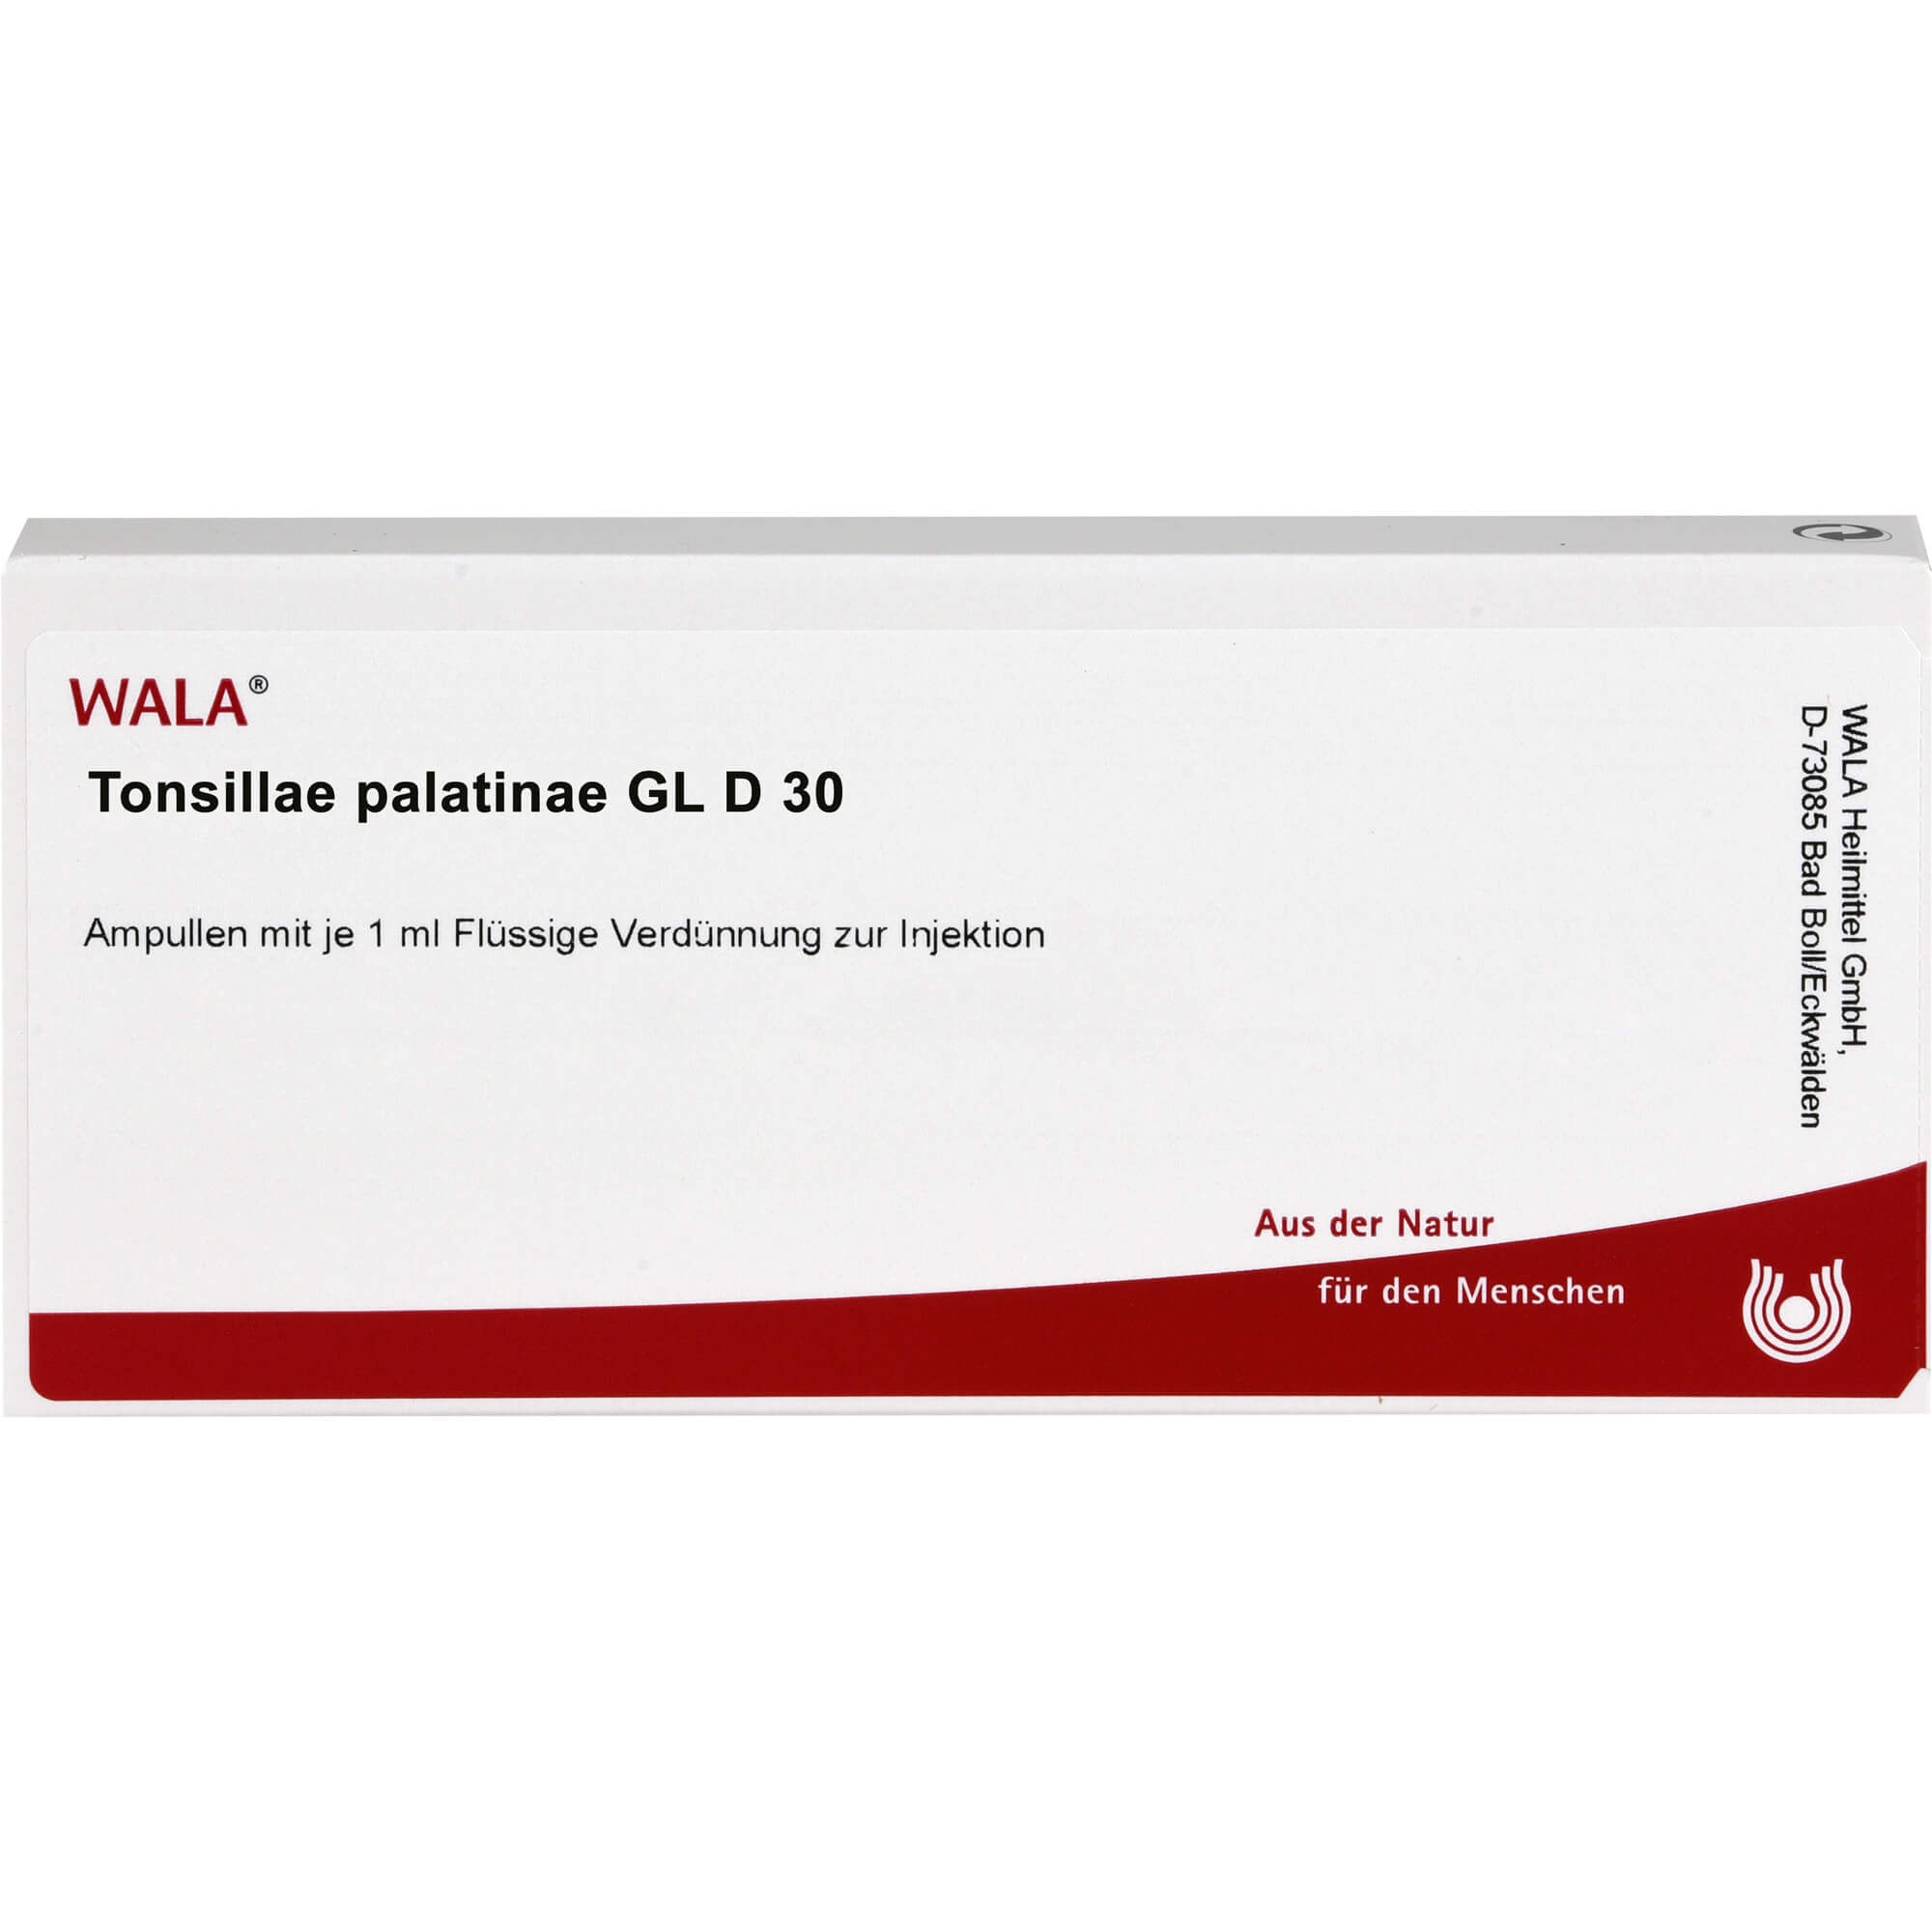 TONSILLAE palatinae GL D 30 Ampullen